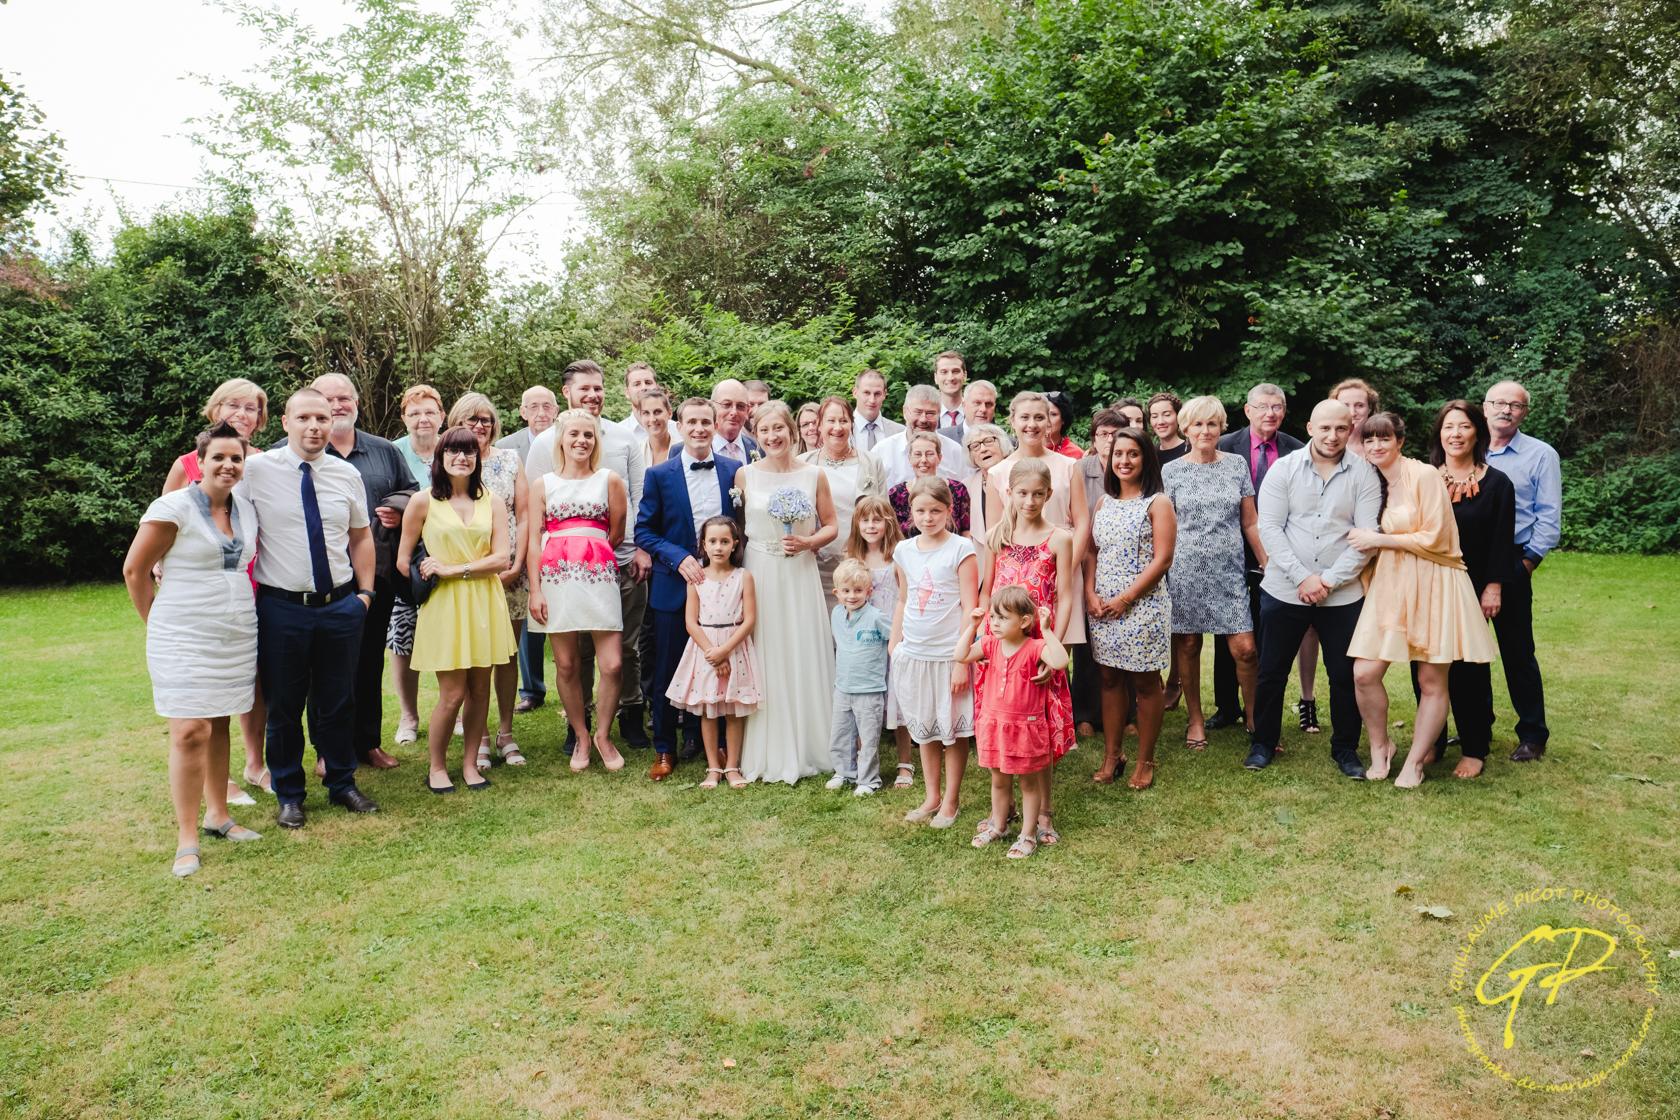 mariage auberge de la garenne Marcq en Baroeul (74 sur 109)